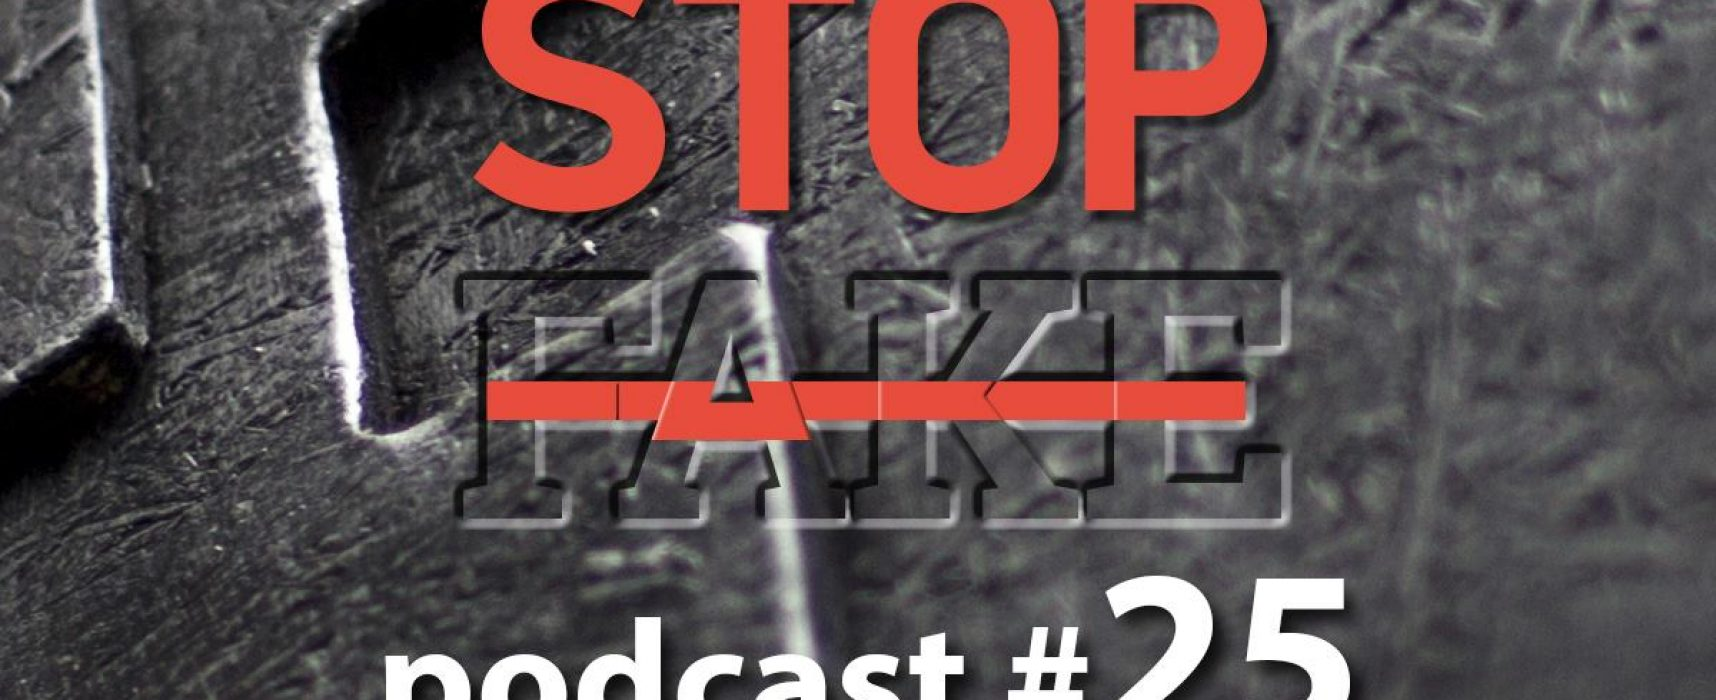 StopFake podcast #25